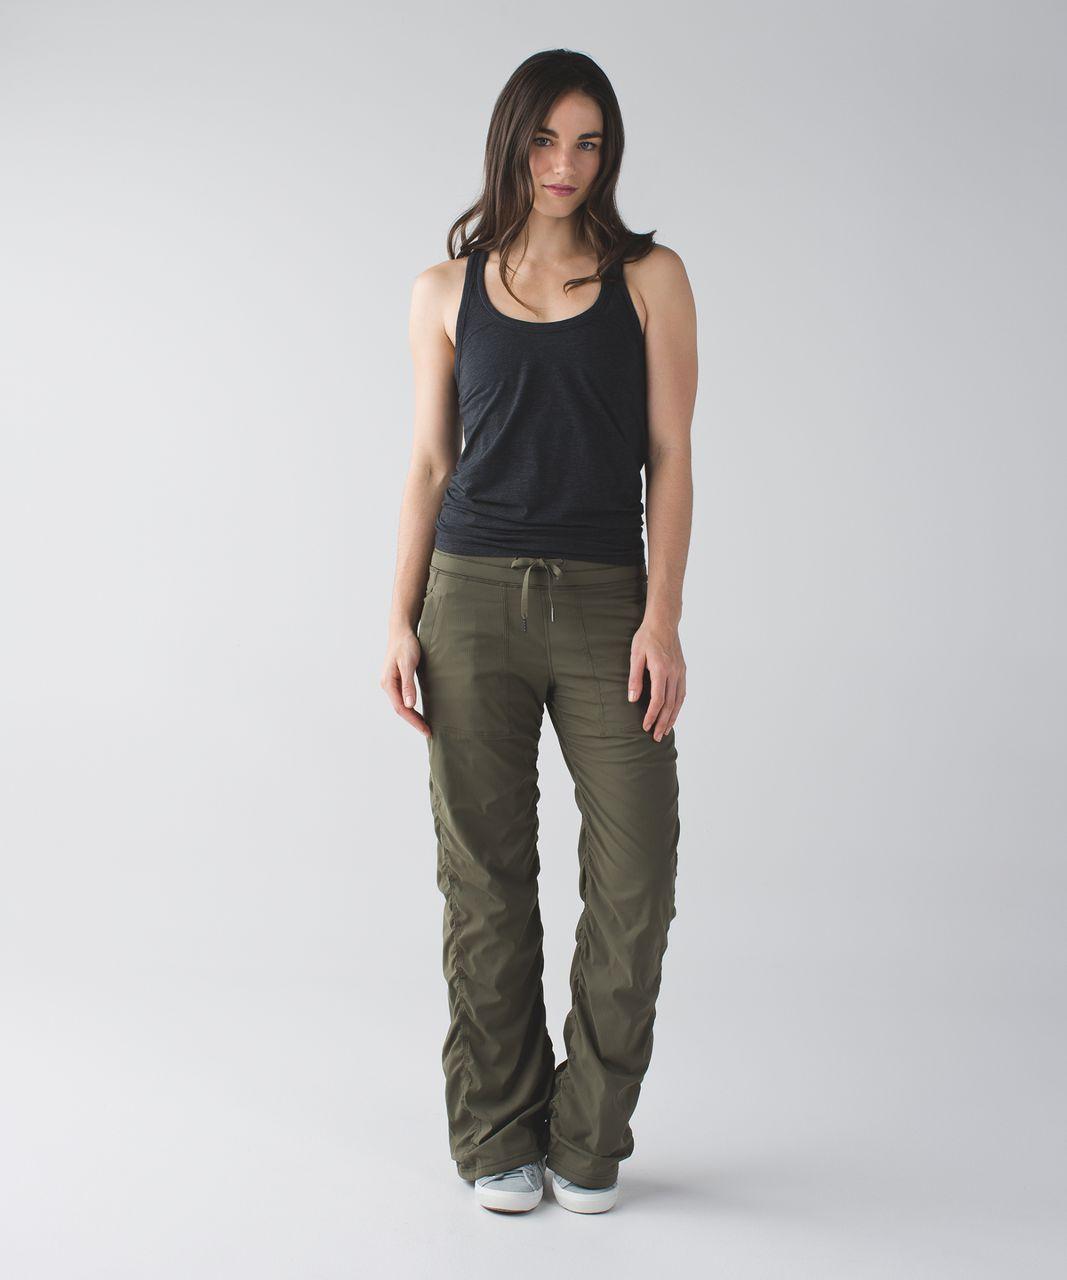 a2818c5ad Lululemon Studio Pant II  Lined (Regular) - Fatigue Green - lulu ...